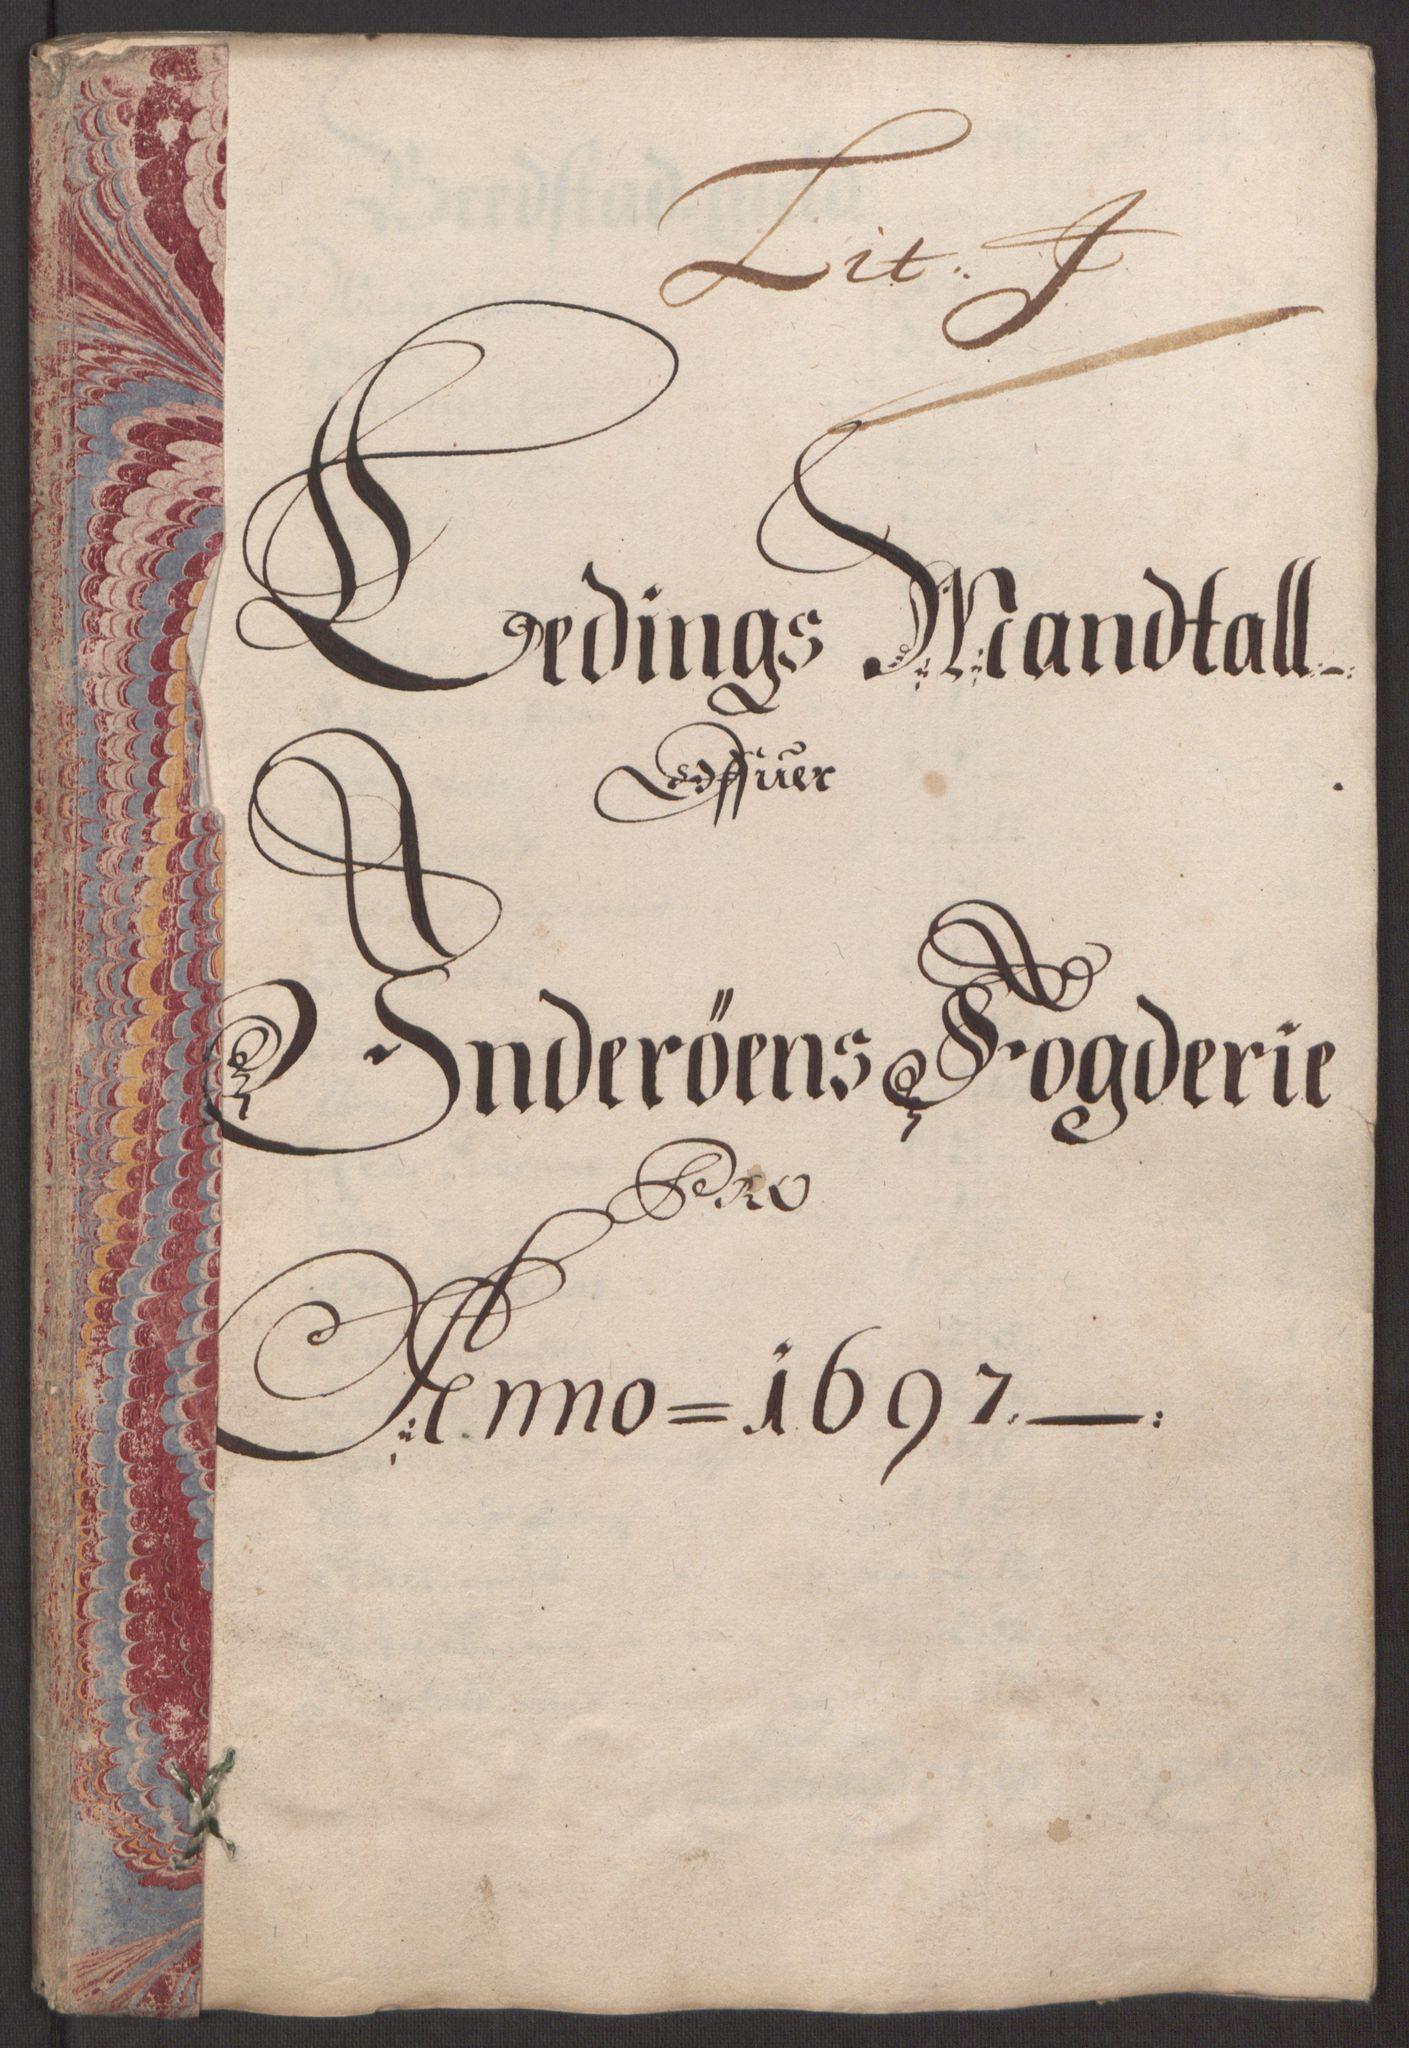 RA, Rentekammeret inntil 1814, Reviderte regnskaper, Fogderegnskap, R63/L4309: Fogderegnskap Inderøy, 1695-1697, s. 467